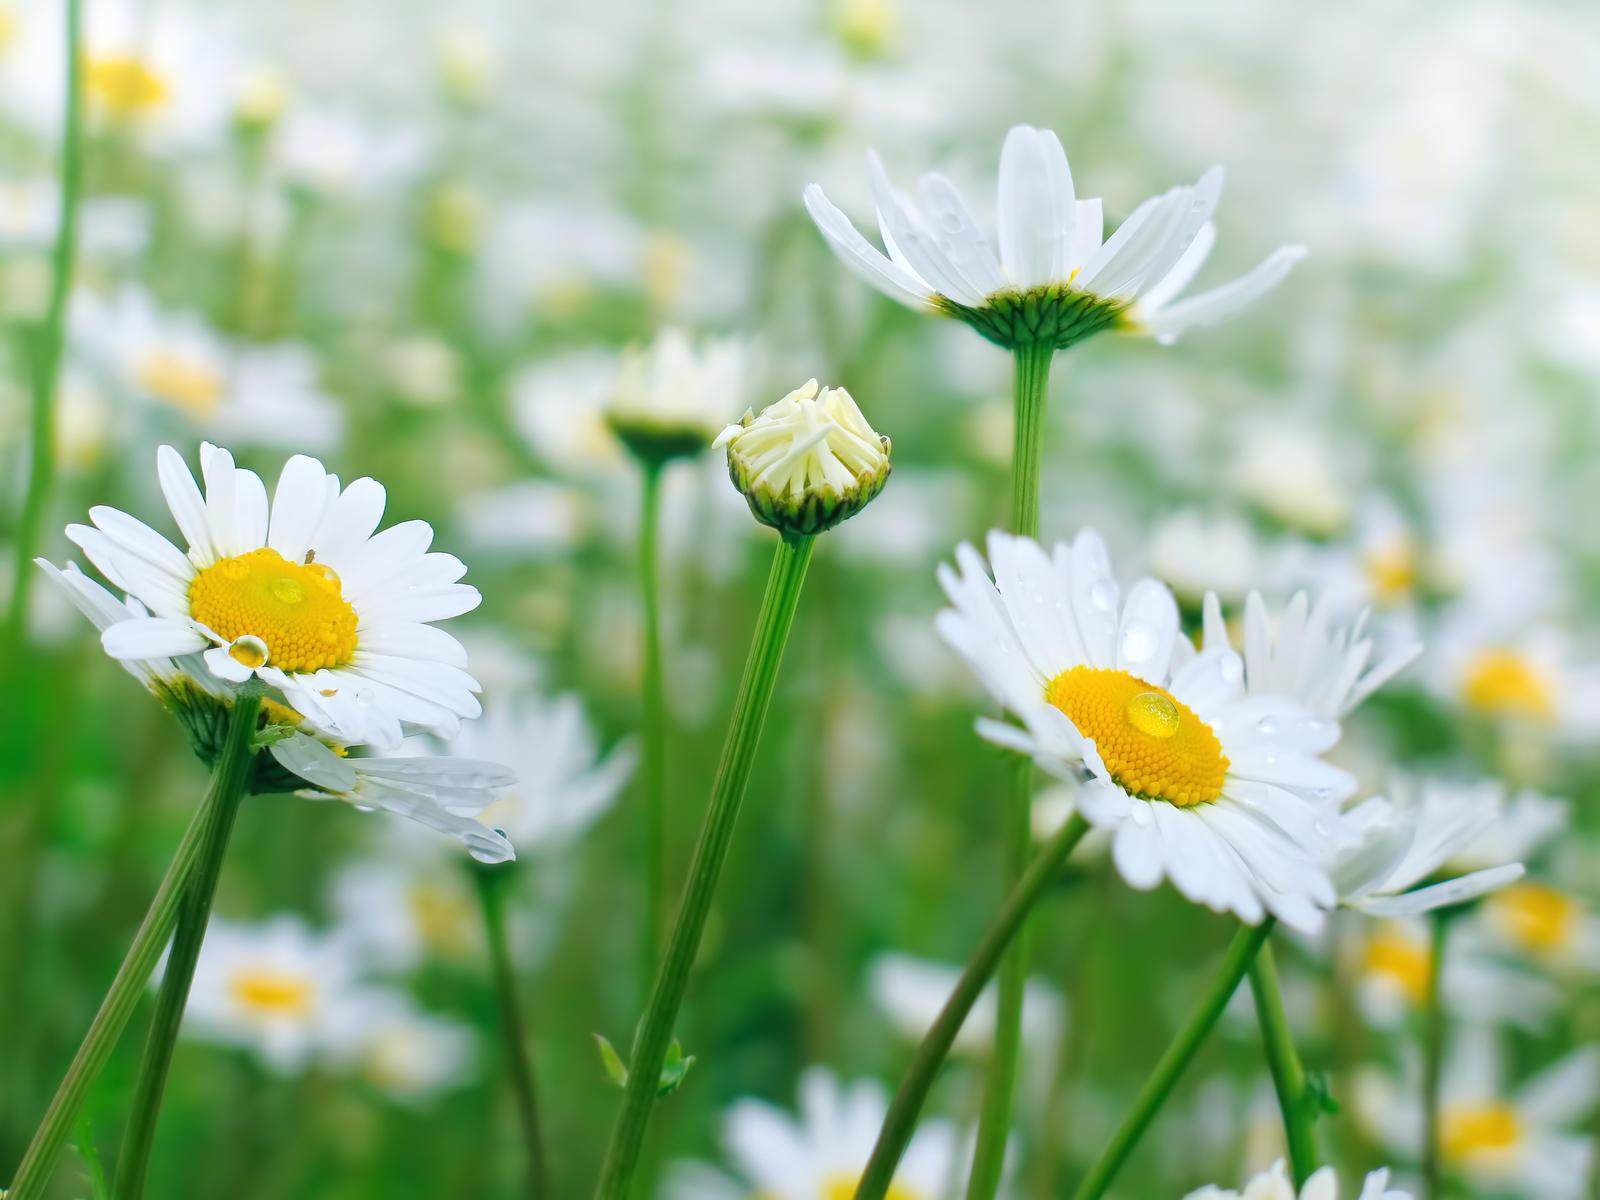 field of daisies by vbmonkey26 on deviantart